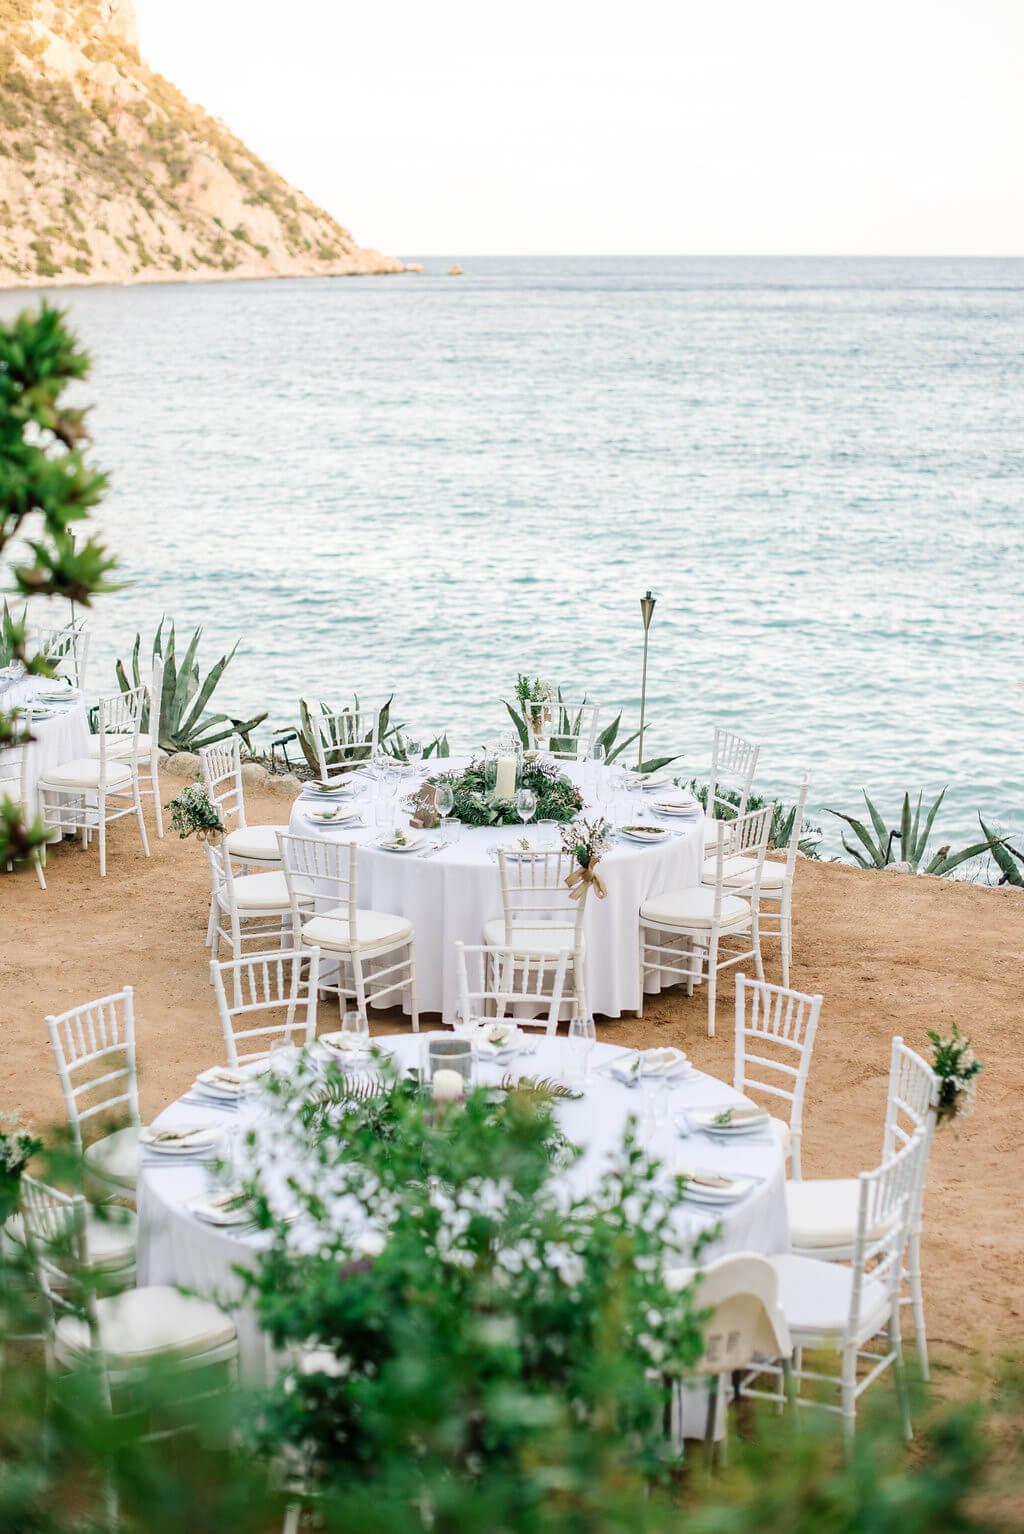 https://www.white-ibiza.com/wp-content/uploads/2020/03/ibiza-wedding-venues-amante-ibiza-2020-06.jpg